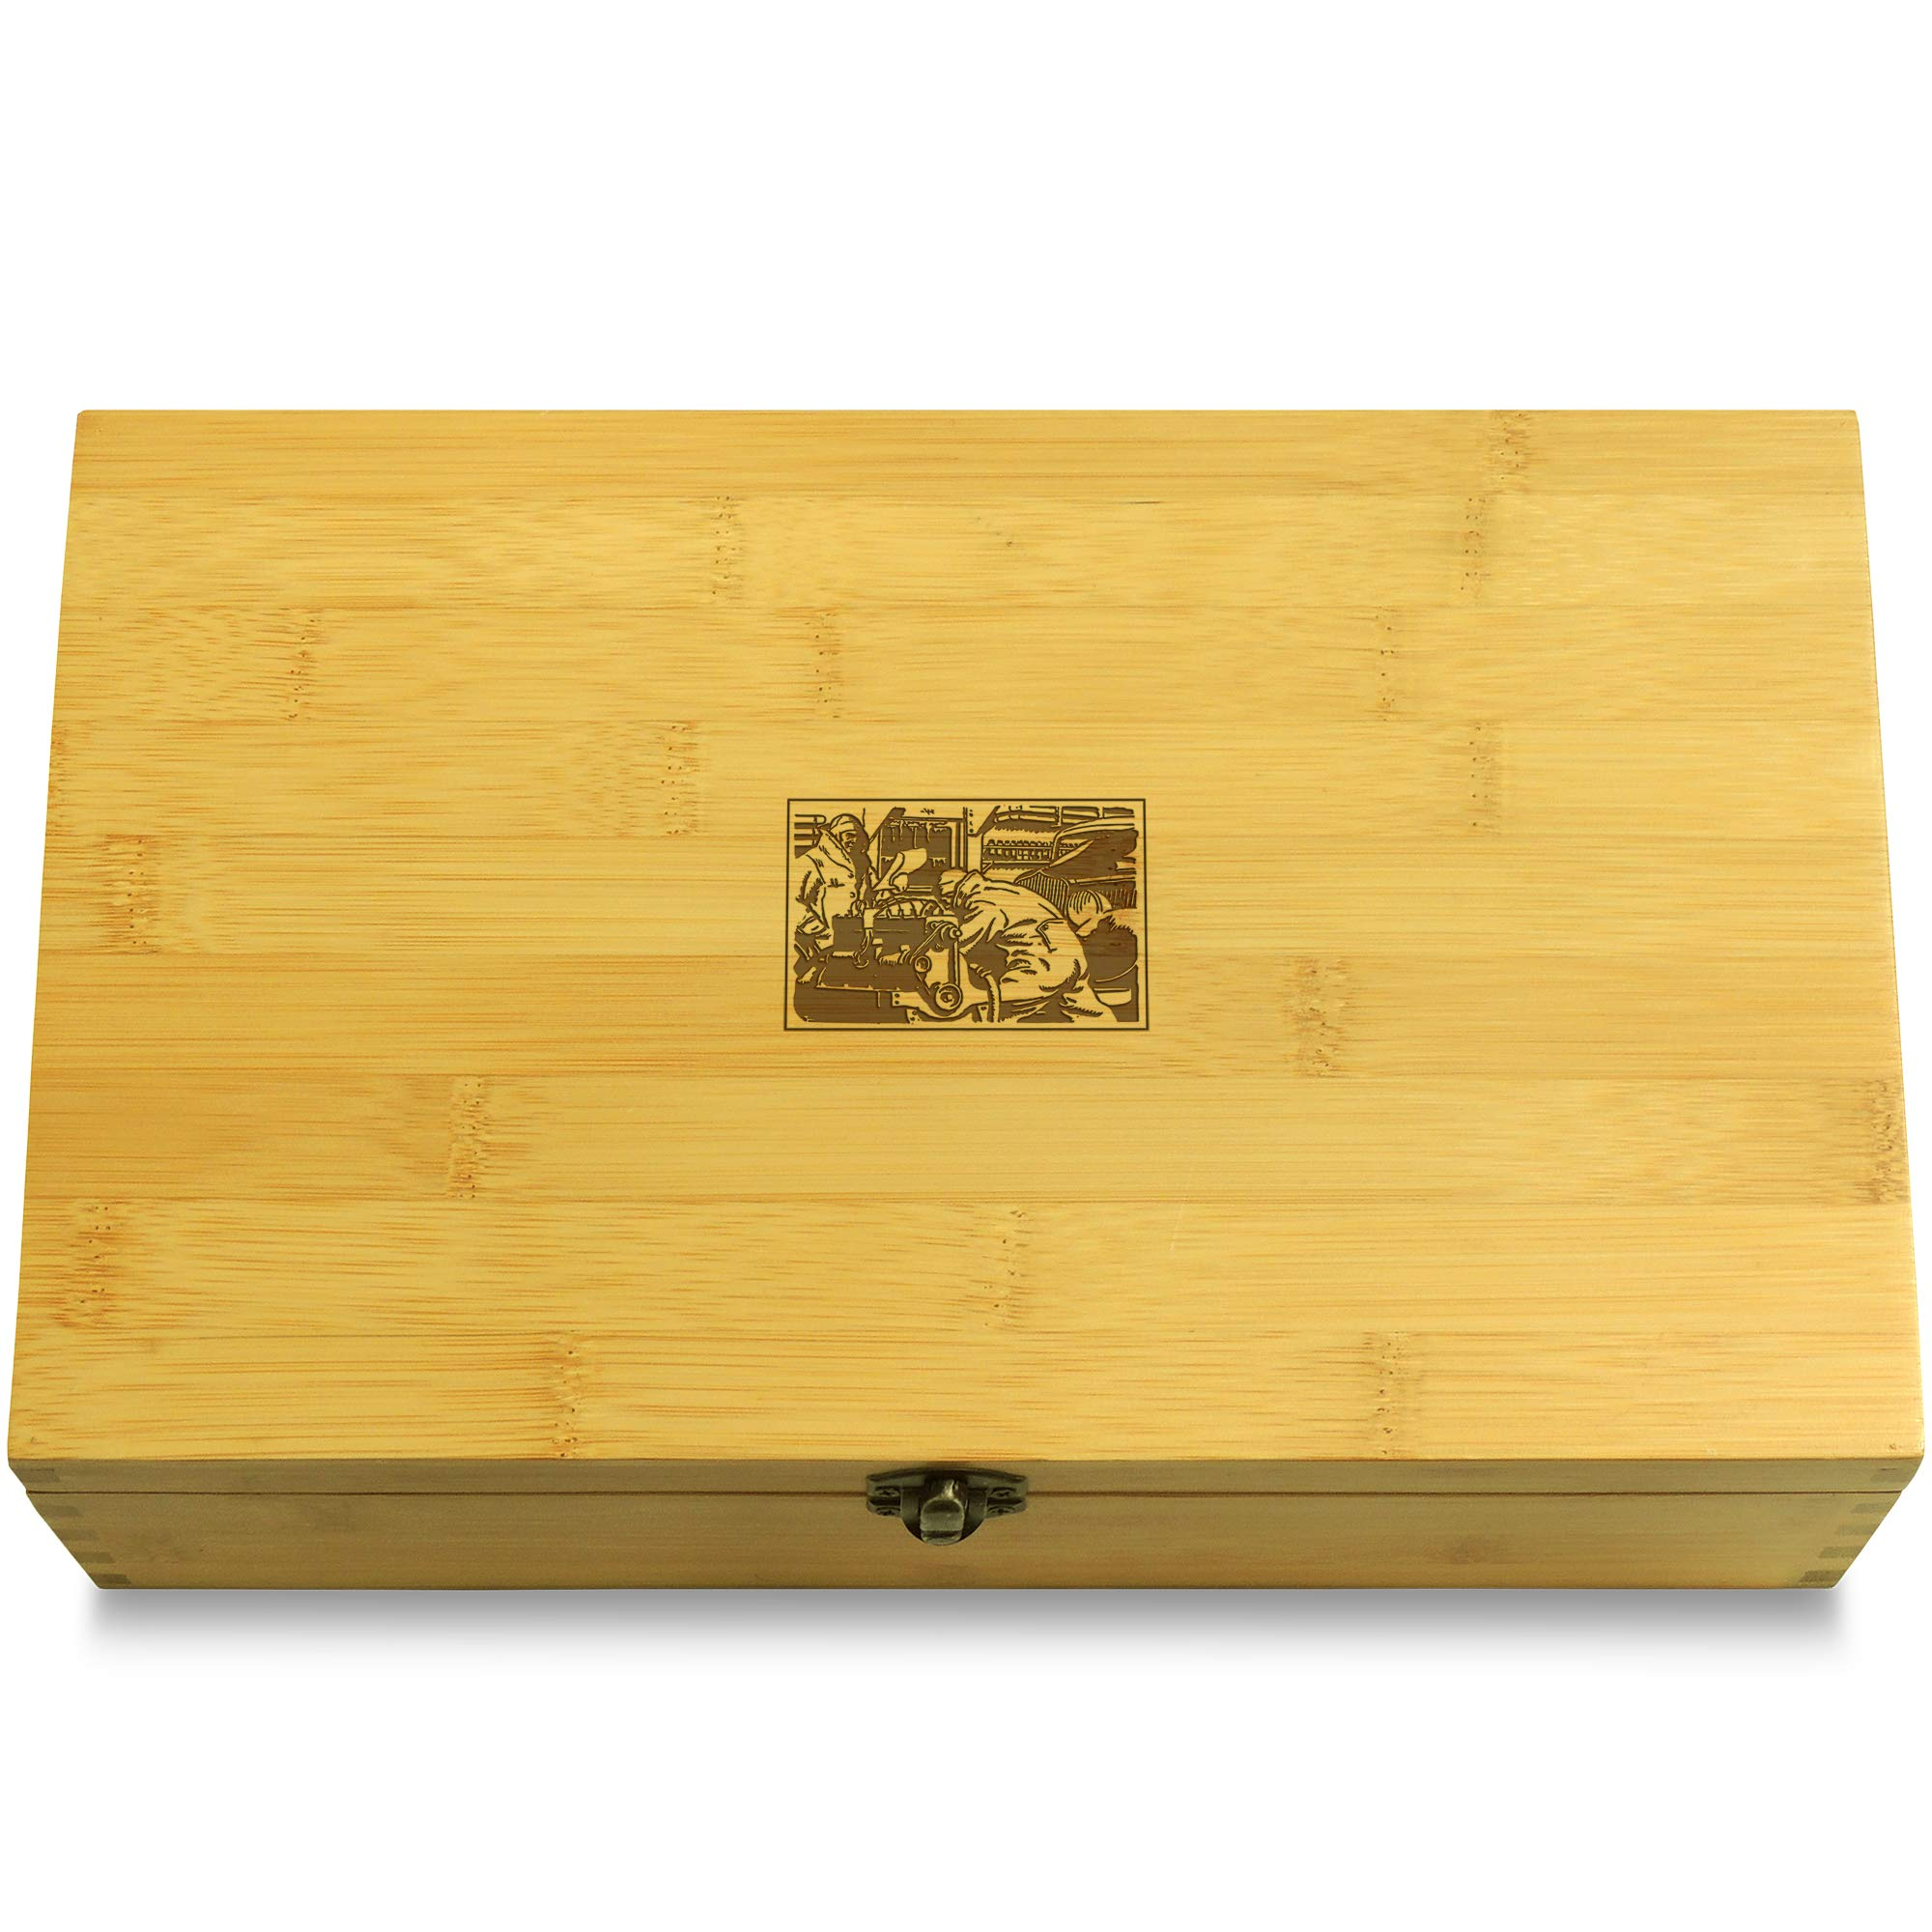 Cookbook People Workshop Car Multikeep Box - Moving Wall Sustainable Bamboo Adjustable Organizer